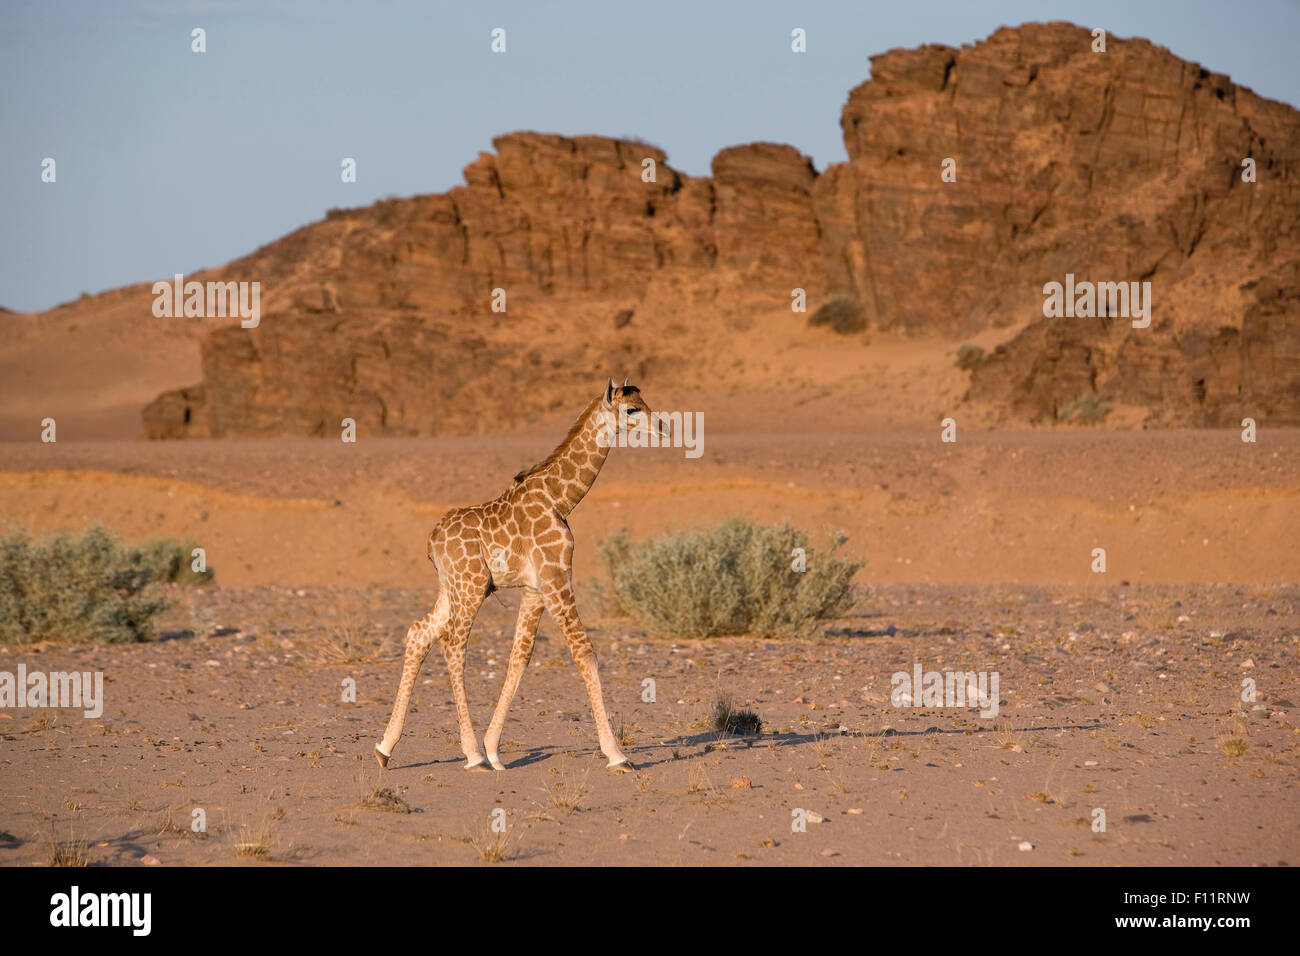 Angolan Giraffe, Namibian Giraffe (Giraffa camelopardalis angolensis) Young walking the desert Namib-Skeleton Coast - Stock Image